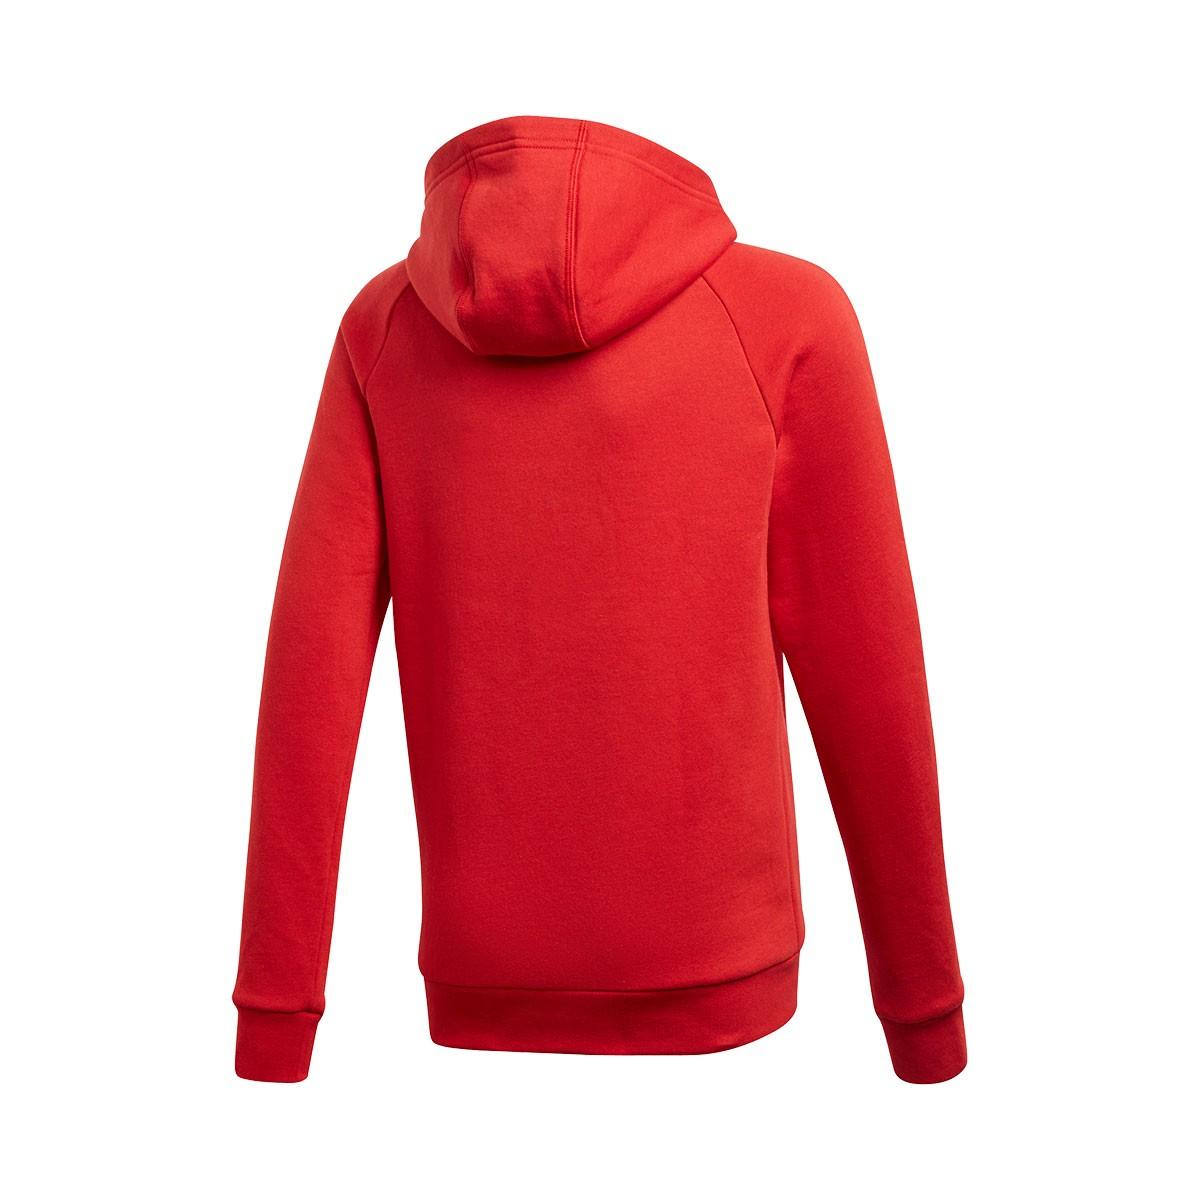 6bebe6fee Sudadera adidas Core 18 Hoody Niño Power red-White - Tienda de fútbol  Fútbol Emotion